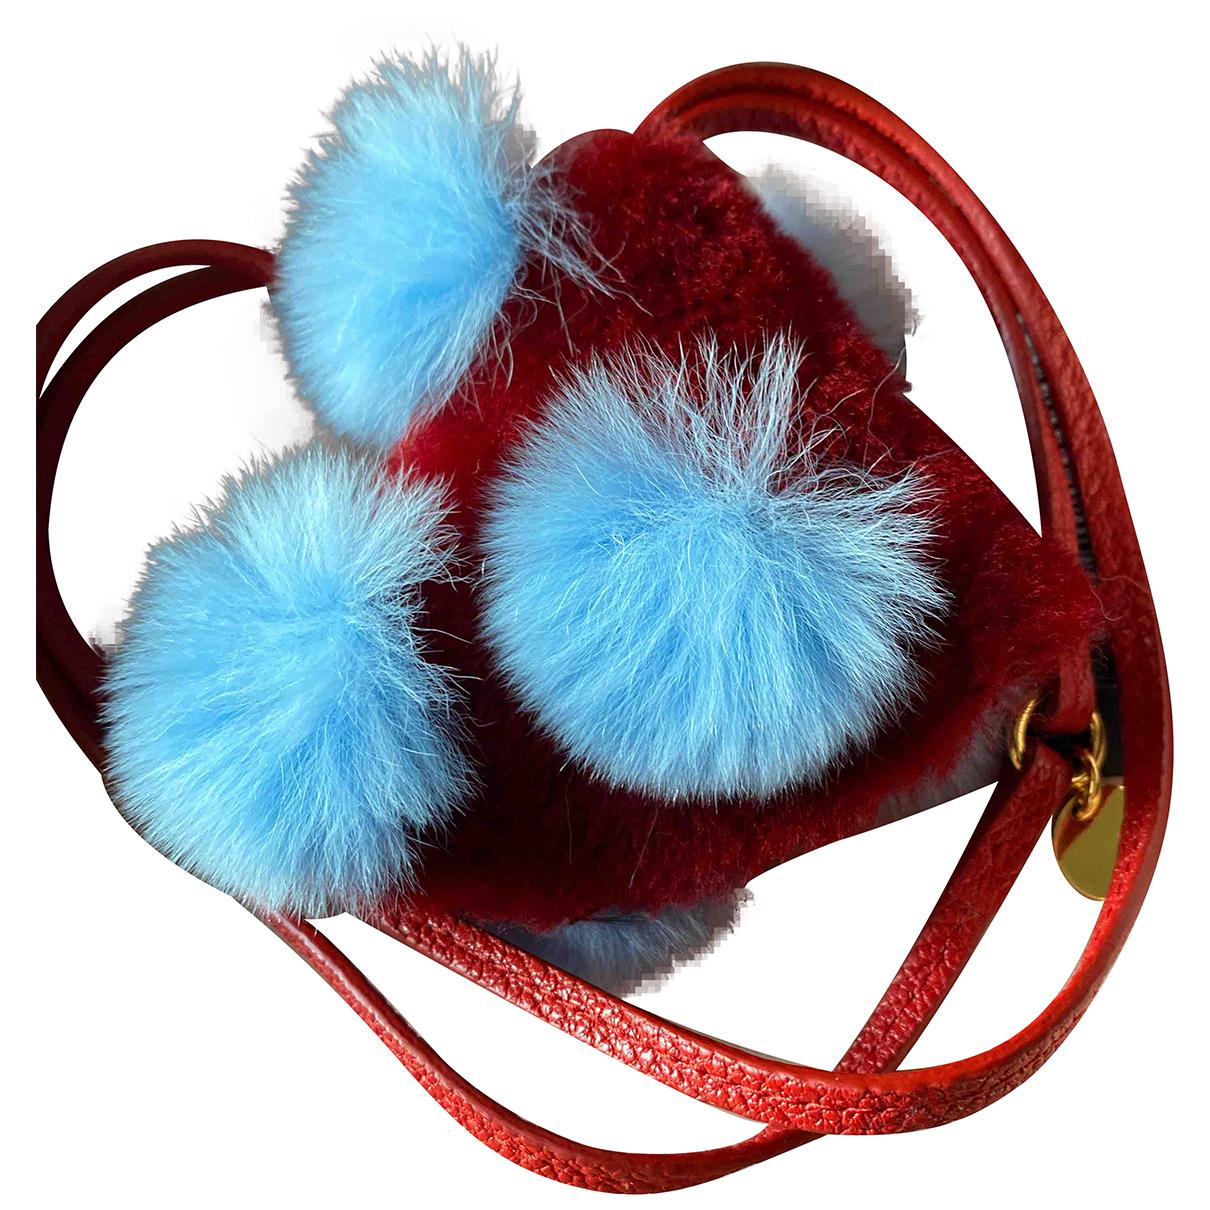 Miu Miu - Petite maroquinerie   pour femme en cuir - rouge